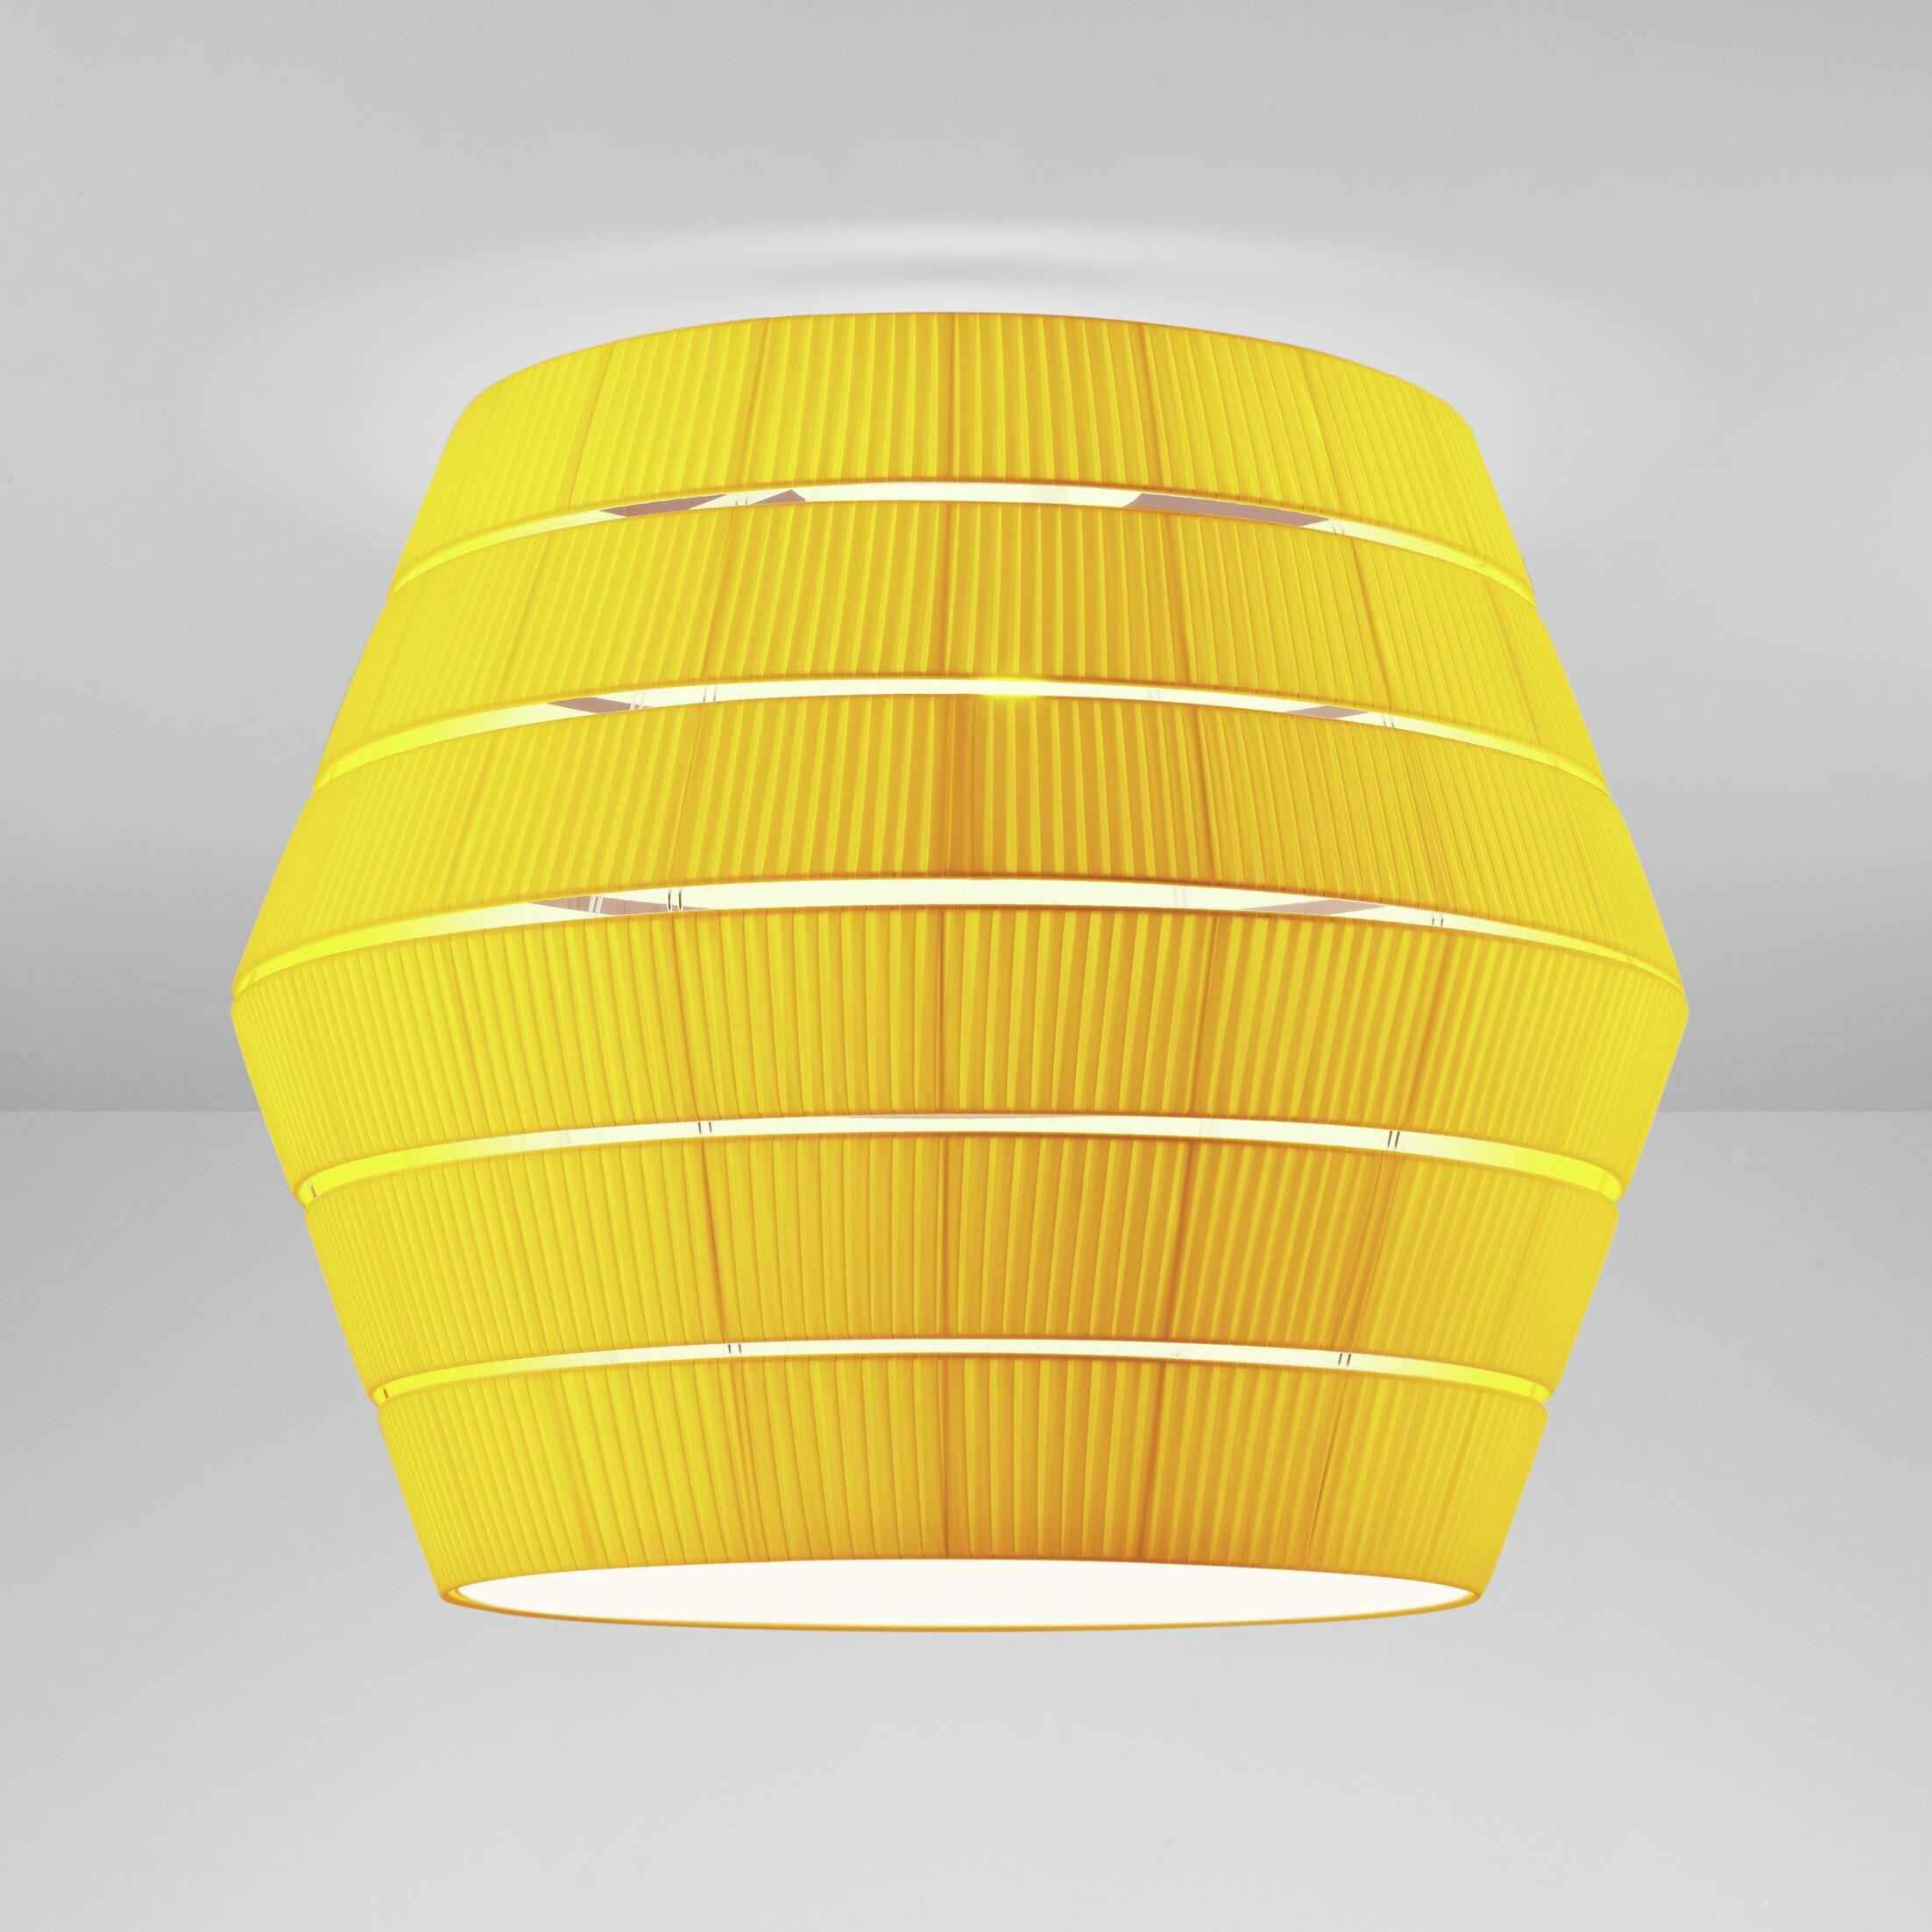 Layers G 3-Light Flush Mount Shade Color: Light Grey